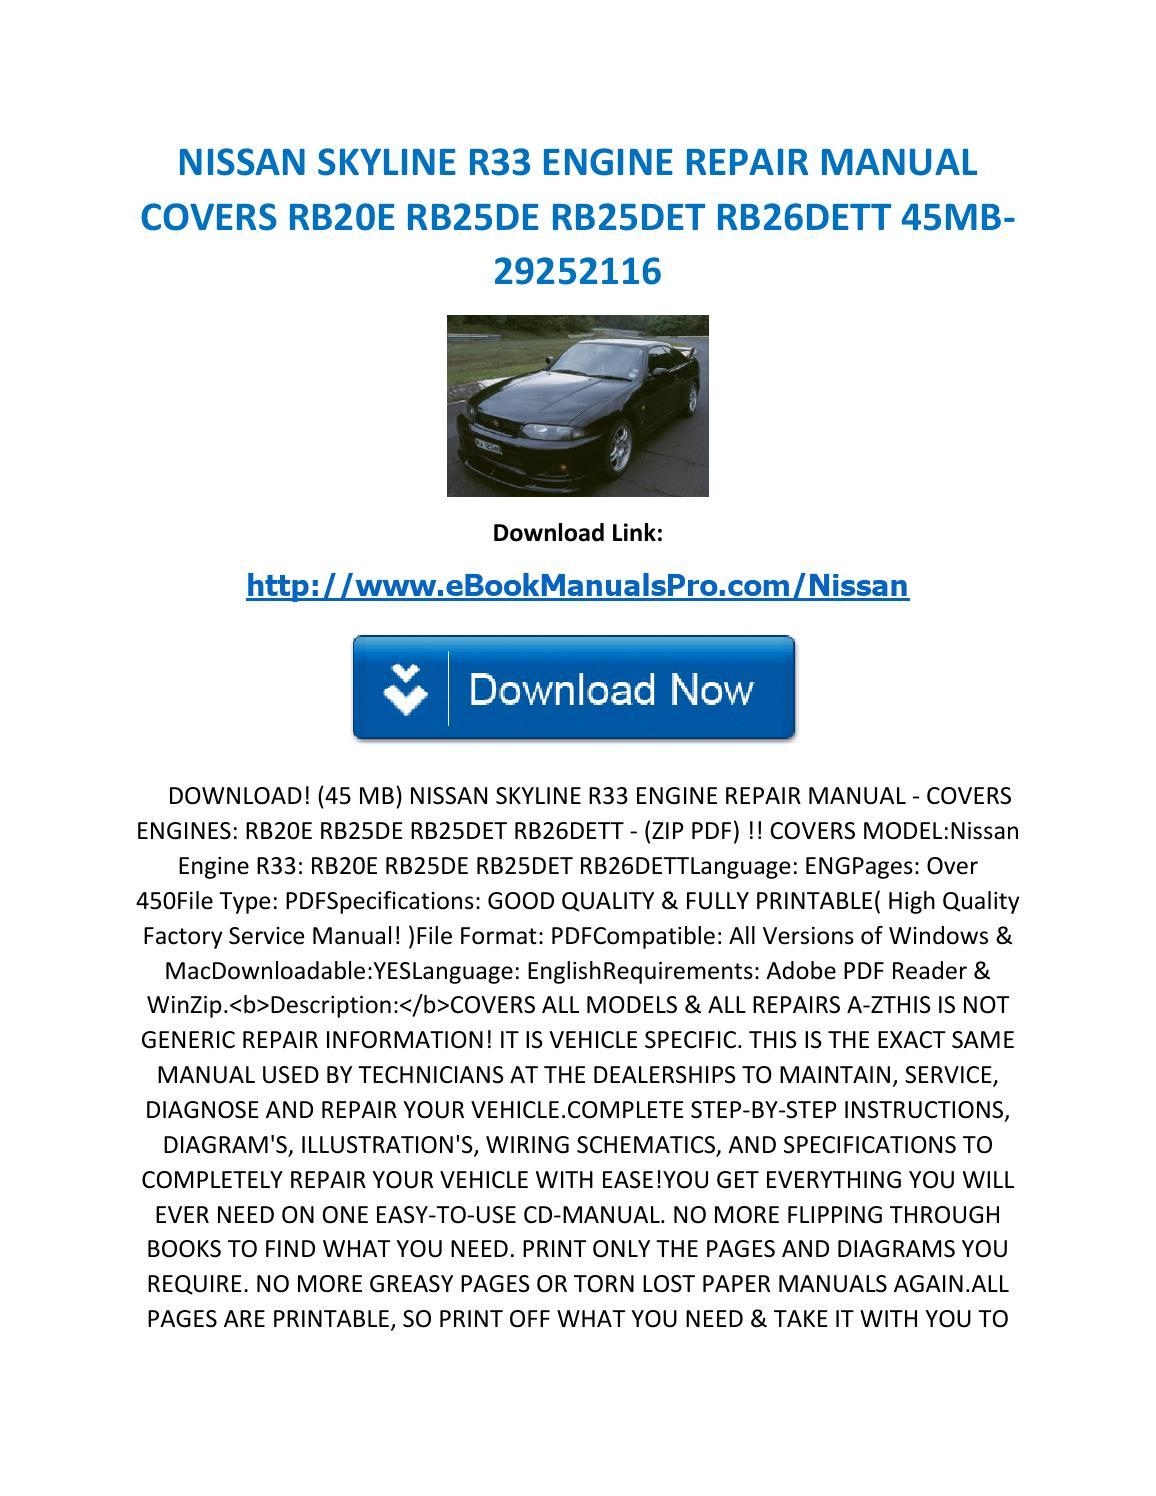 Nissan Skyline R33 Engine Repair Manual Covers Rb20e Rb25de Rb25det Wiring Diagram Rb26dett 45mb 29252116 By Karl Casino Issuu